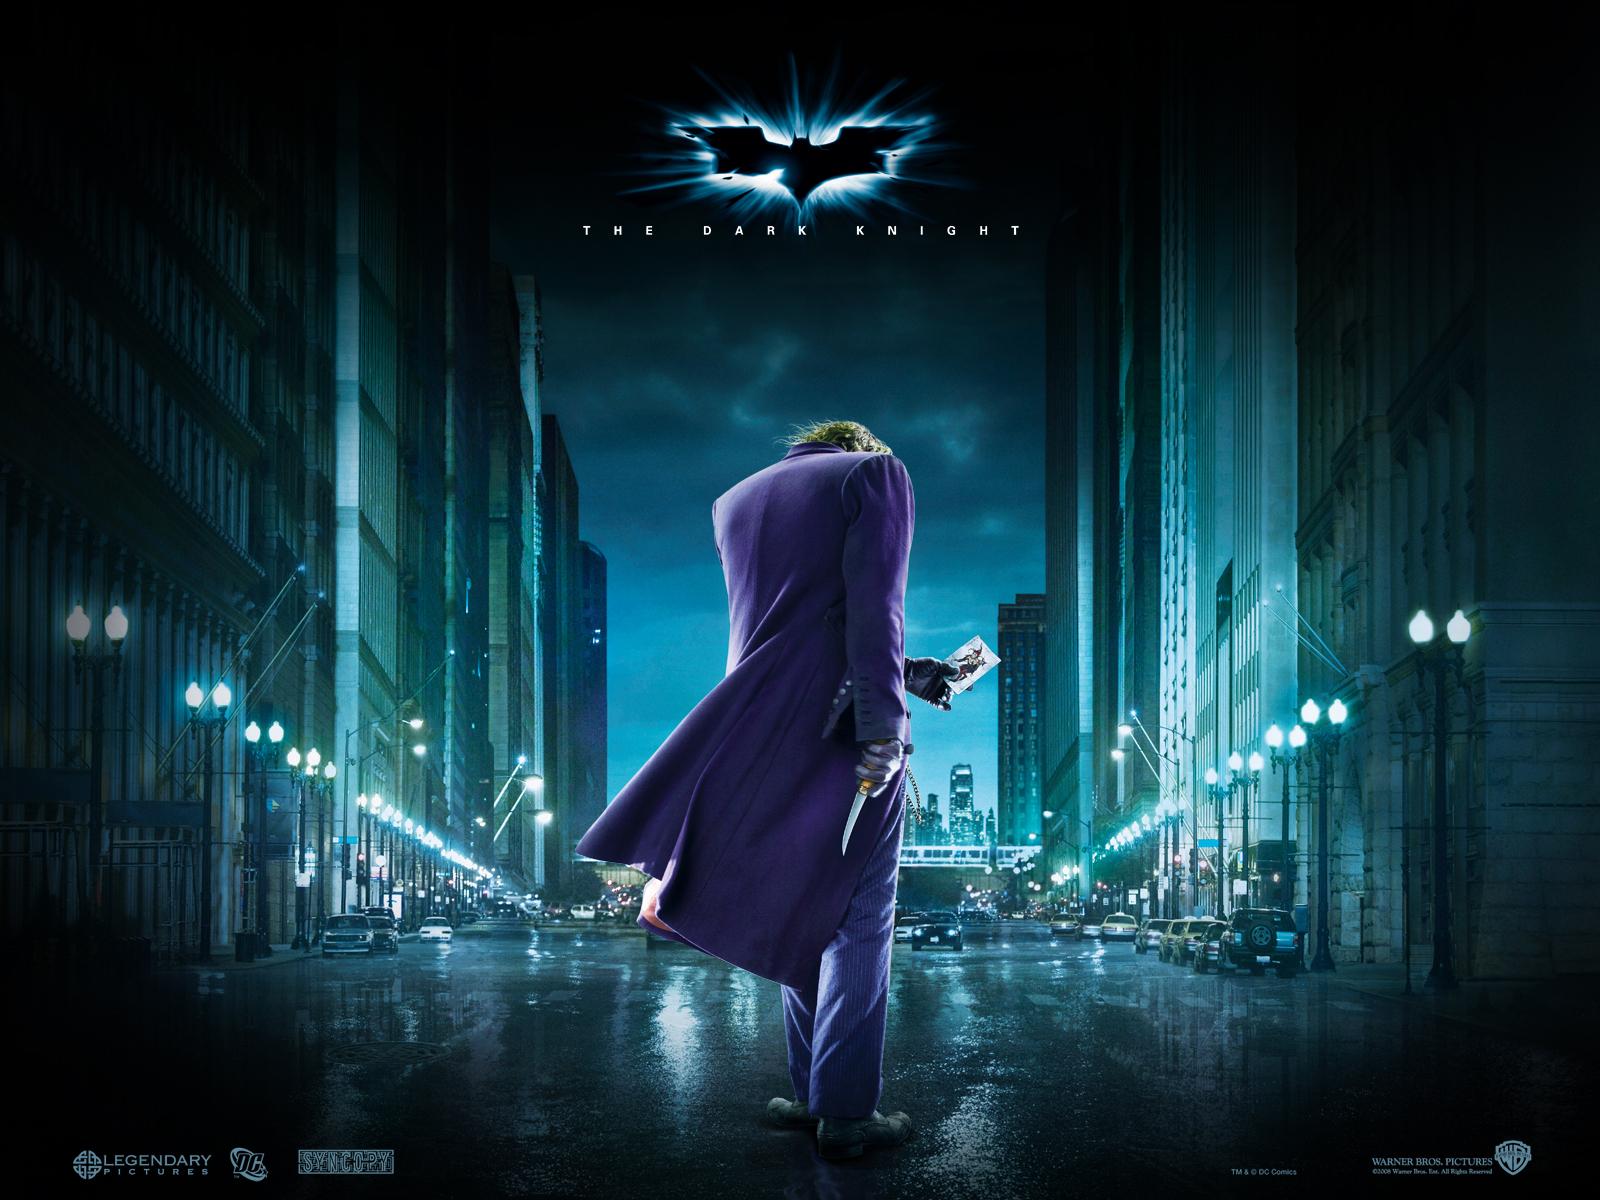 http://images2.fanpop.com/images/photos/7300000/Batman-the-dark-knight-7358620-1600-1200.jpg